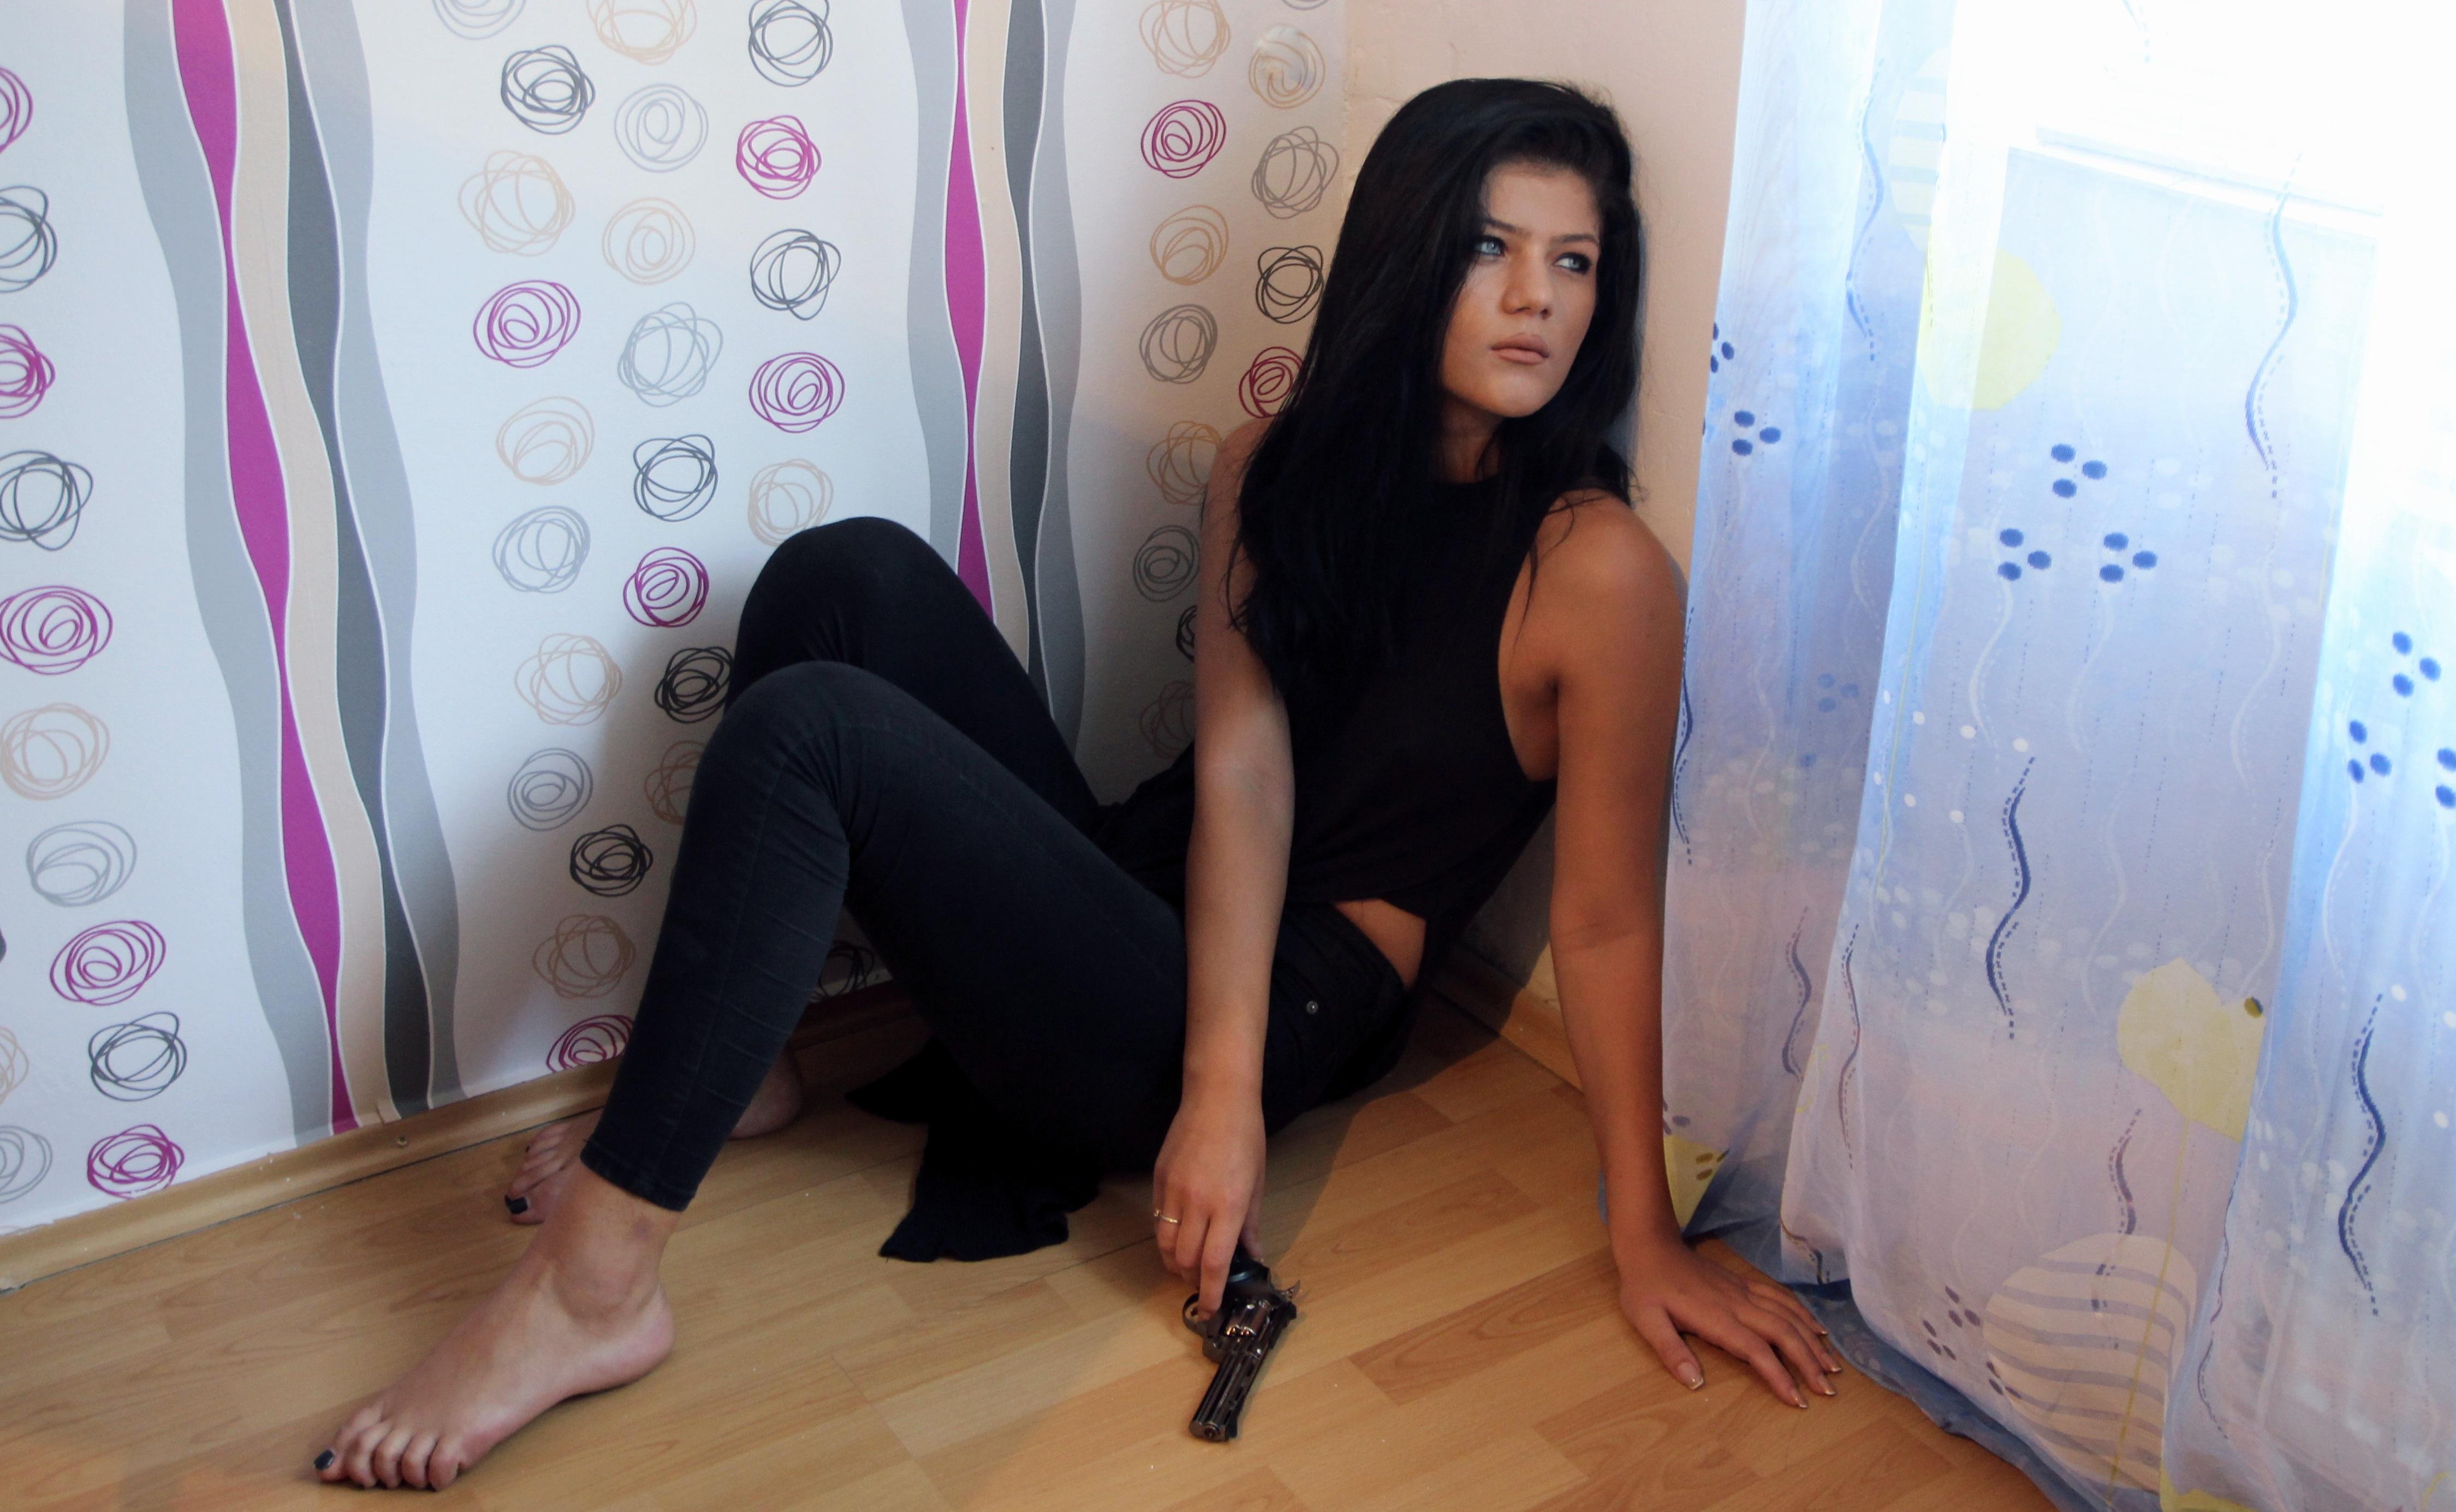 images gratuites main fille jambe tristesse arme corps humain cheveux noirs peur. Black Bedroom Furniture Sets. Home Design Ideas